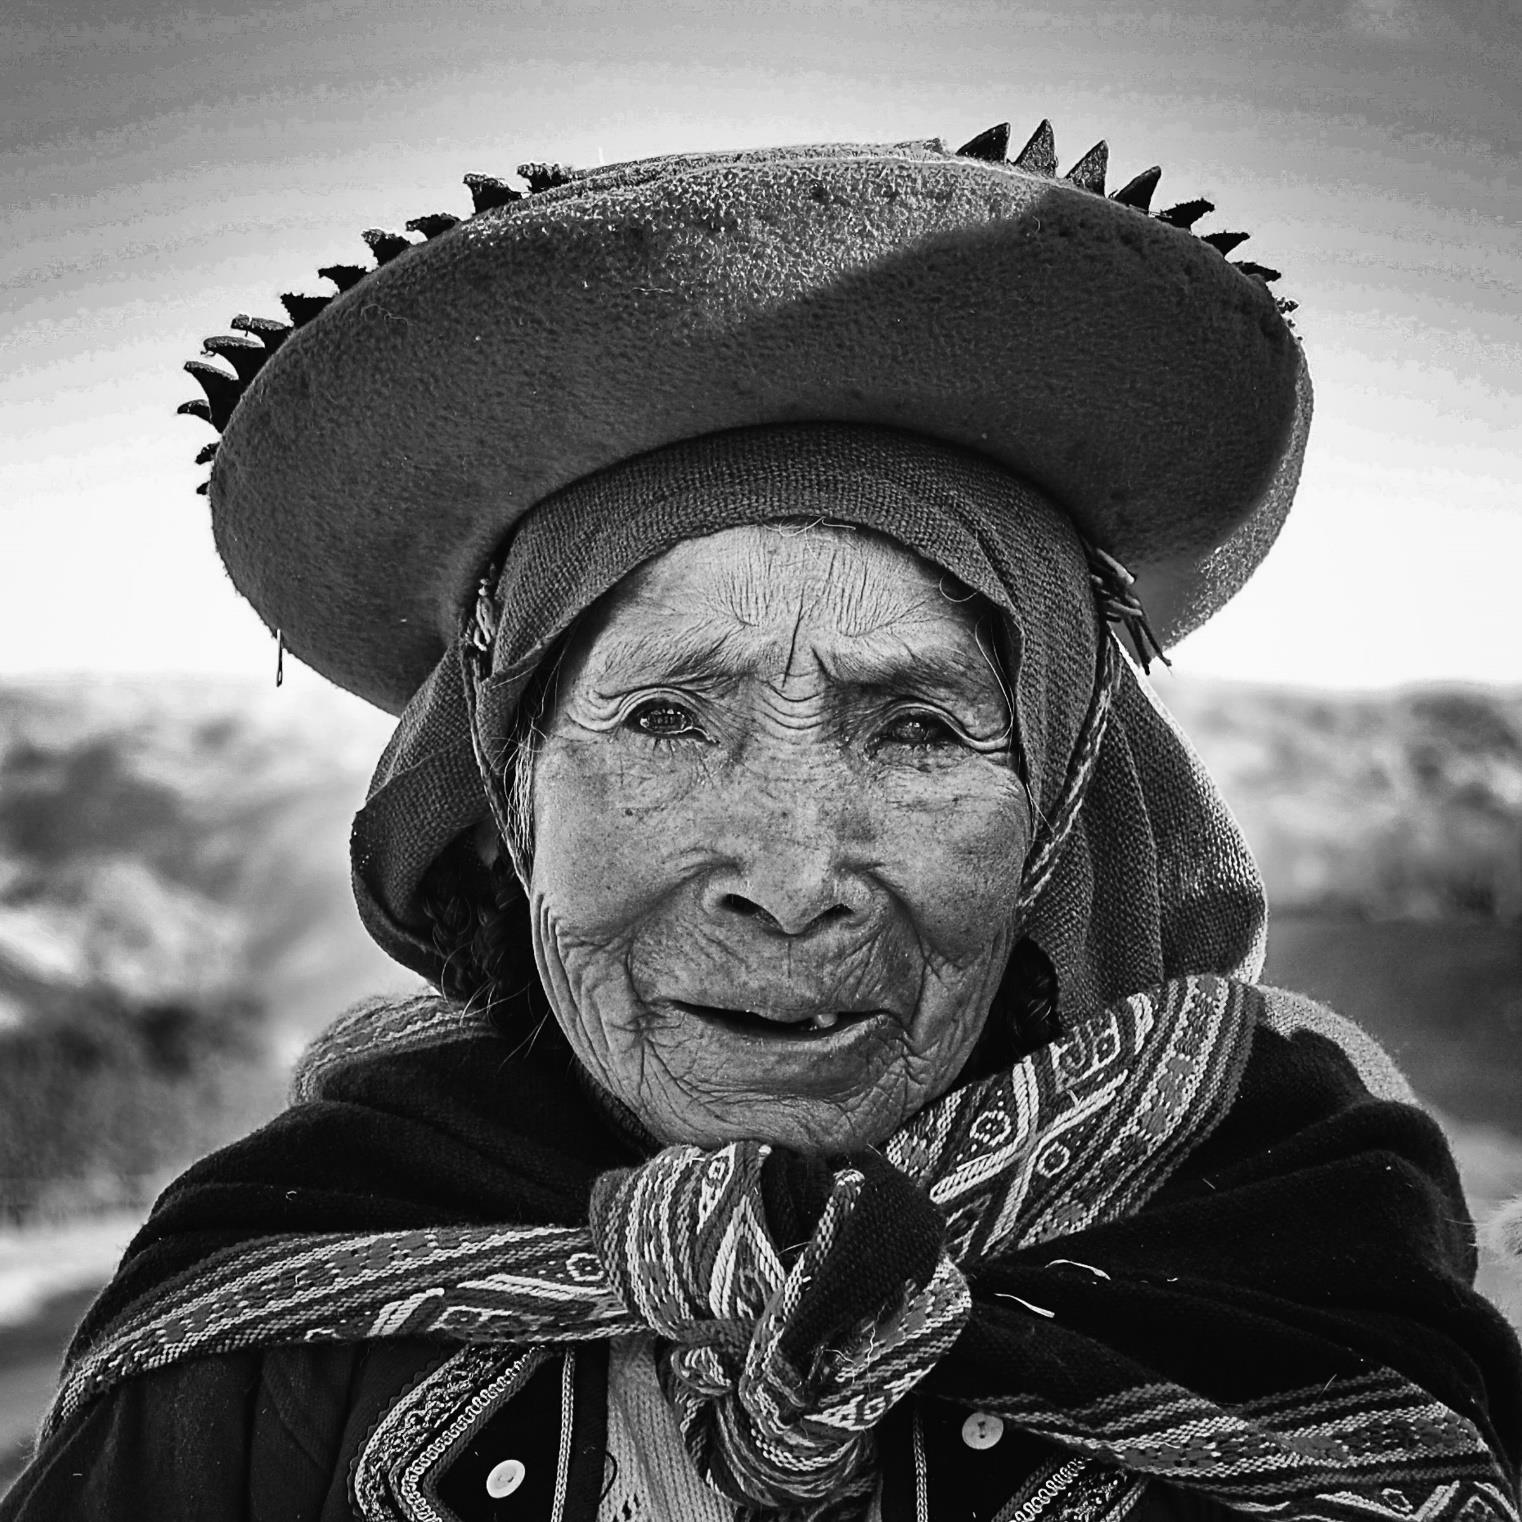 Peruvian Woman (foto: Linh Hoang, Trondhjems Kameraklubb)